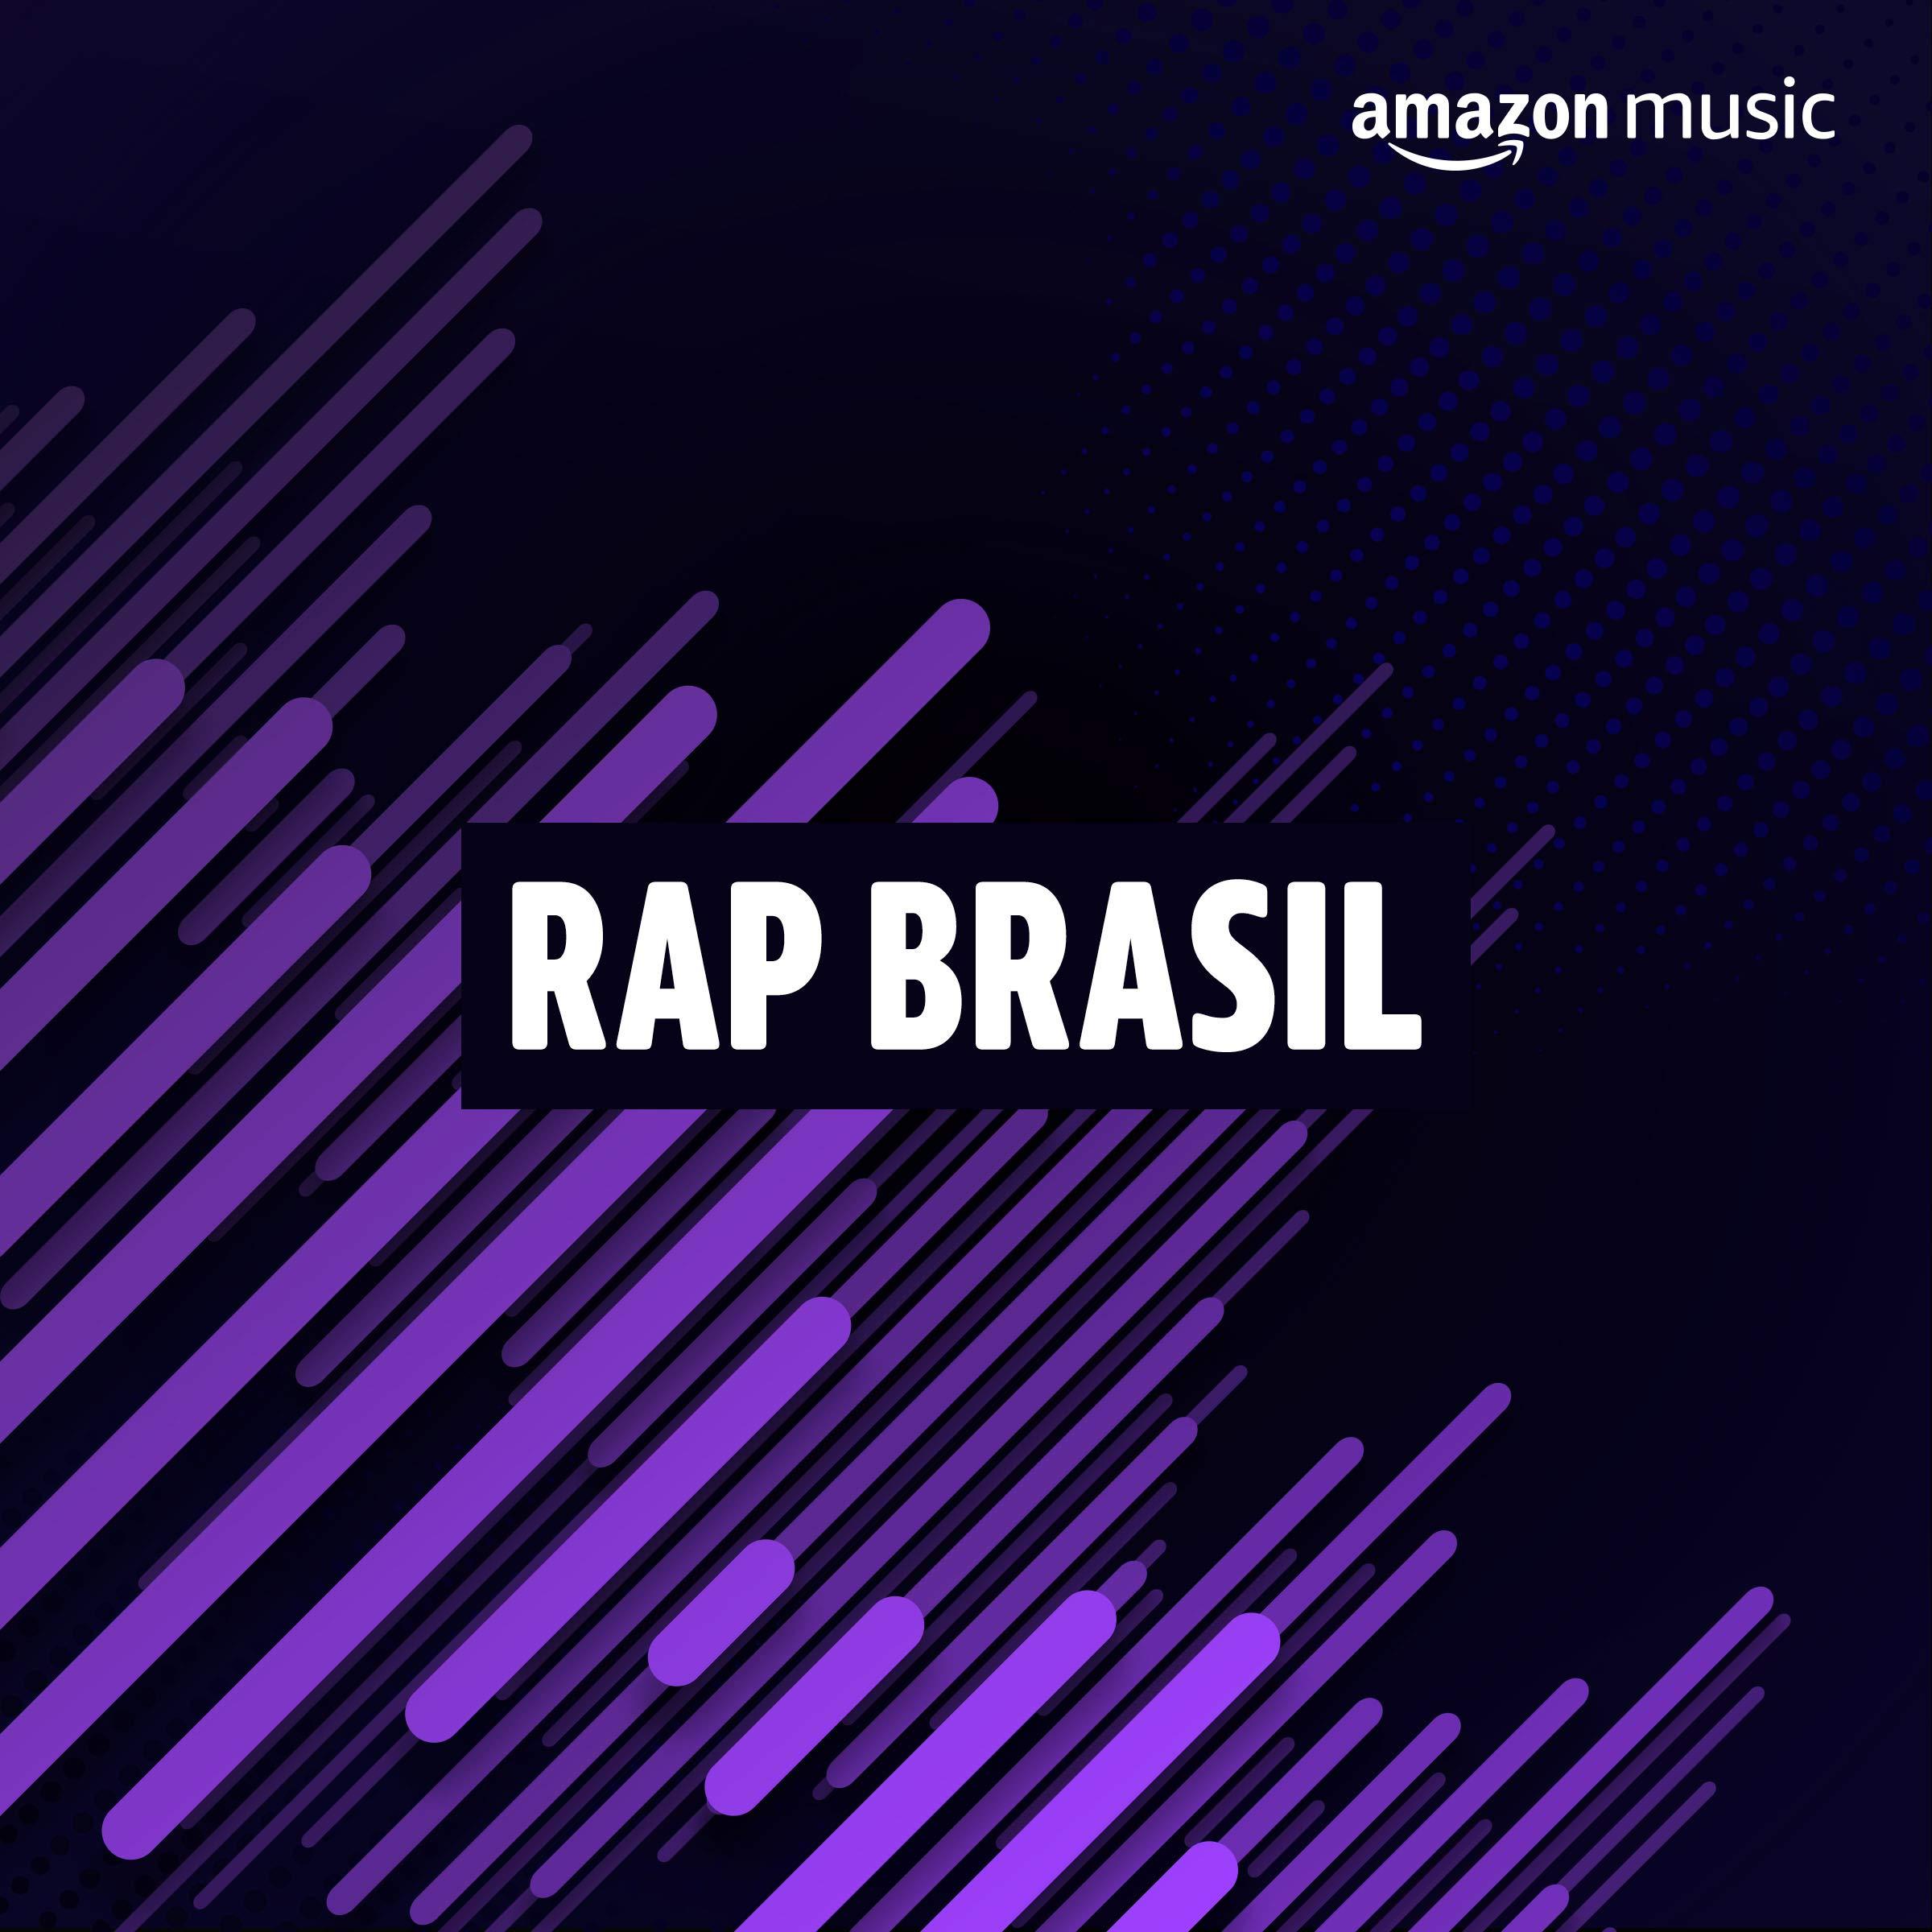 Djonga em Amazon Music Unlimited